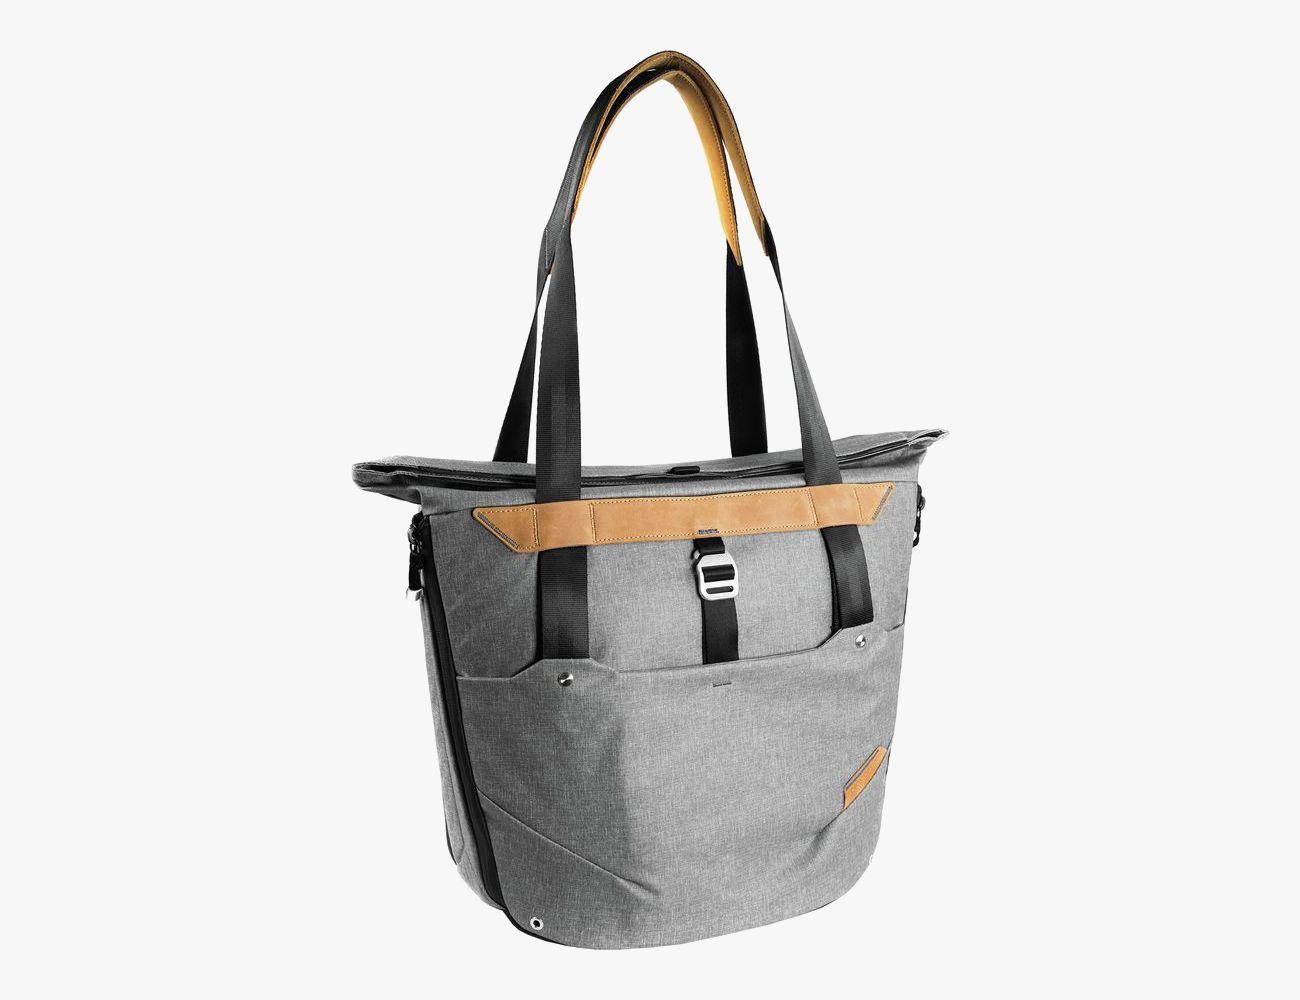 Awe Inspiring The Best Tote Bags For Summer 2018 Gear Patrol Inzonedesignstudio Interior Chair Design Inzonedesignstudiocom